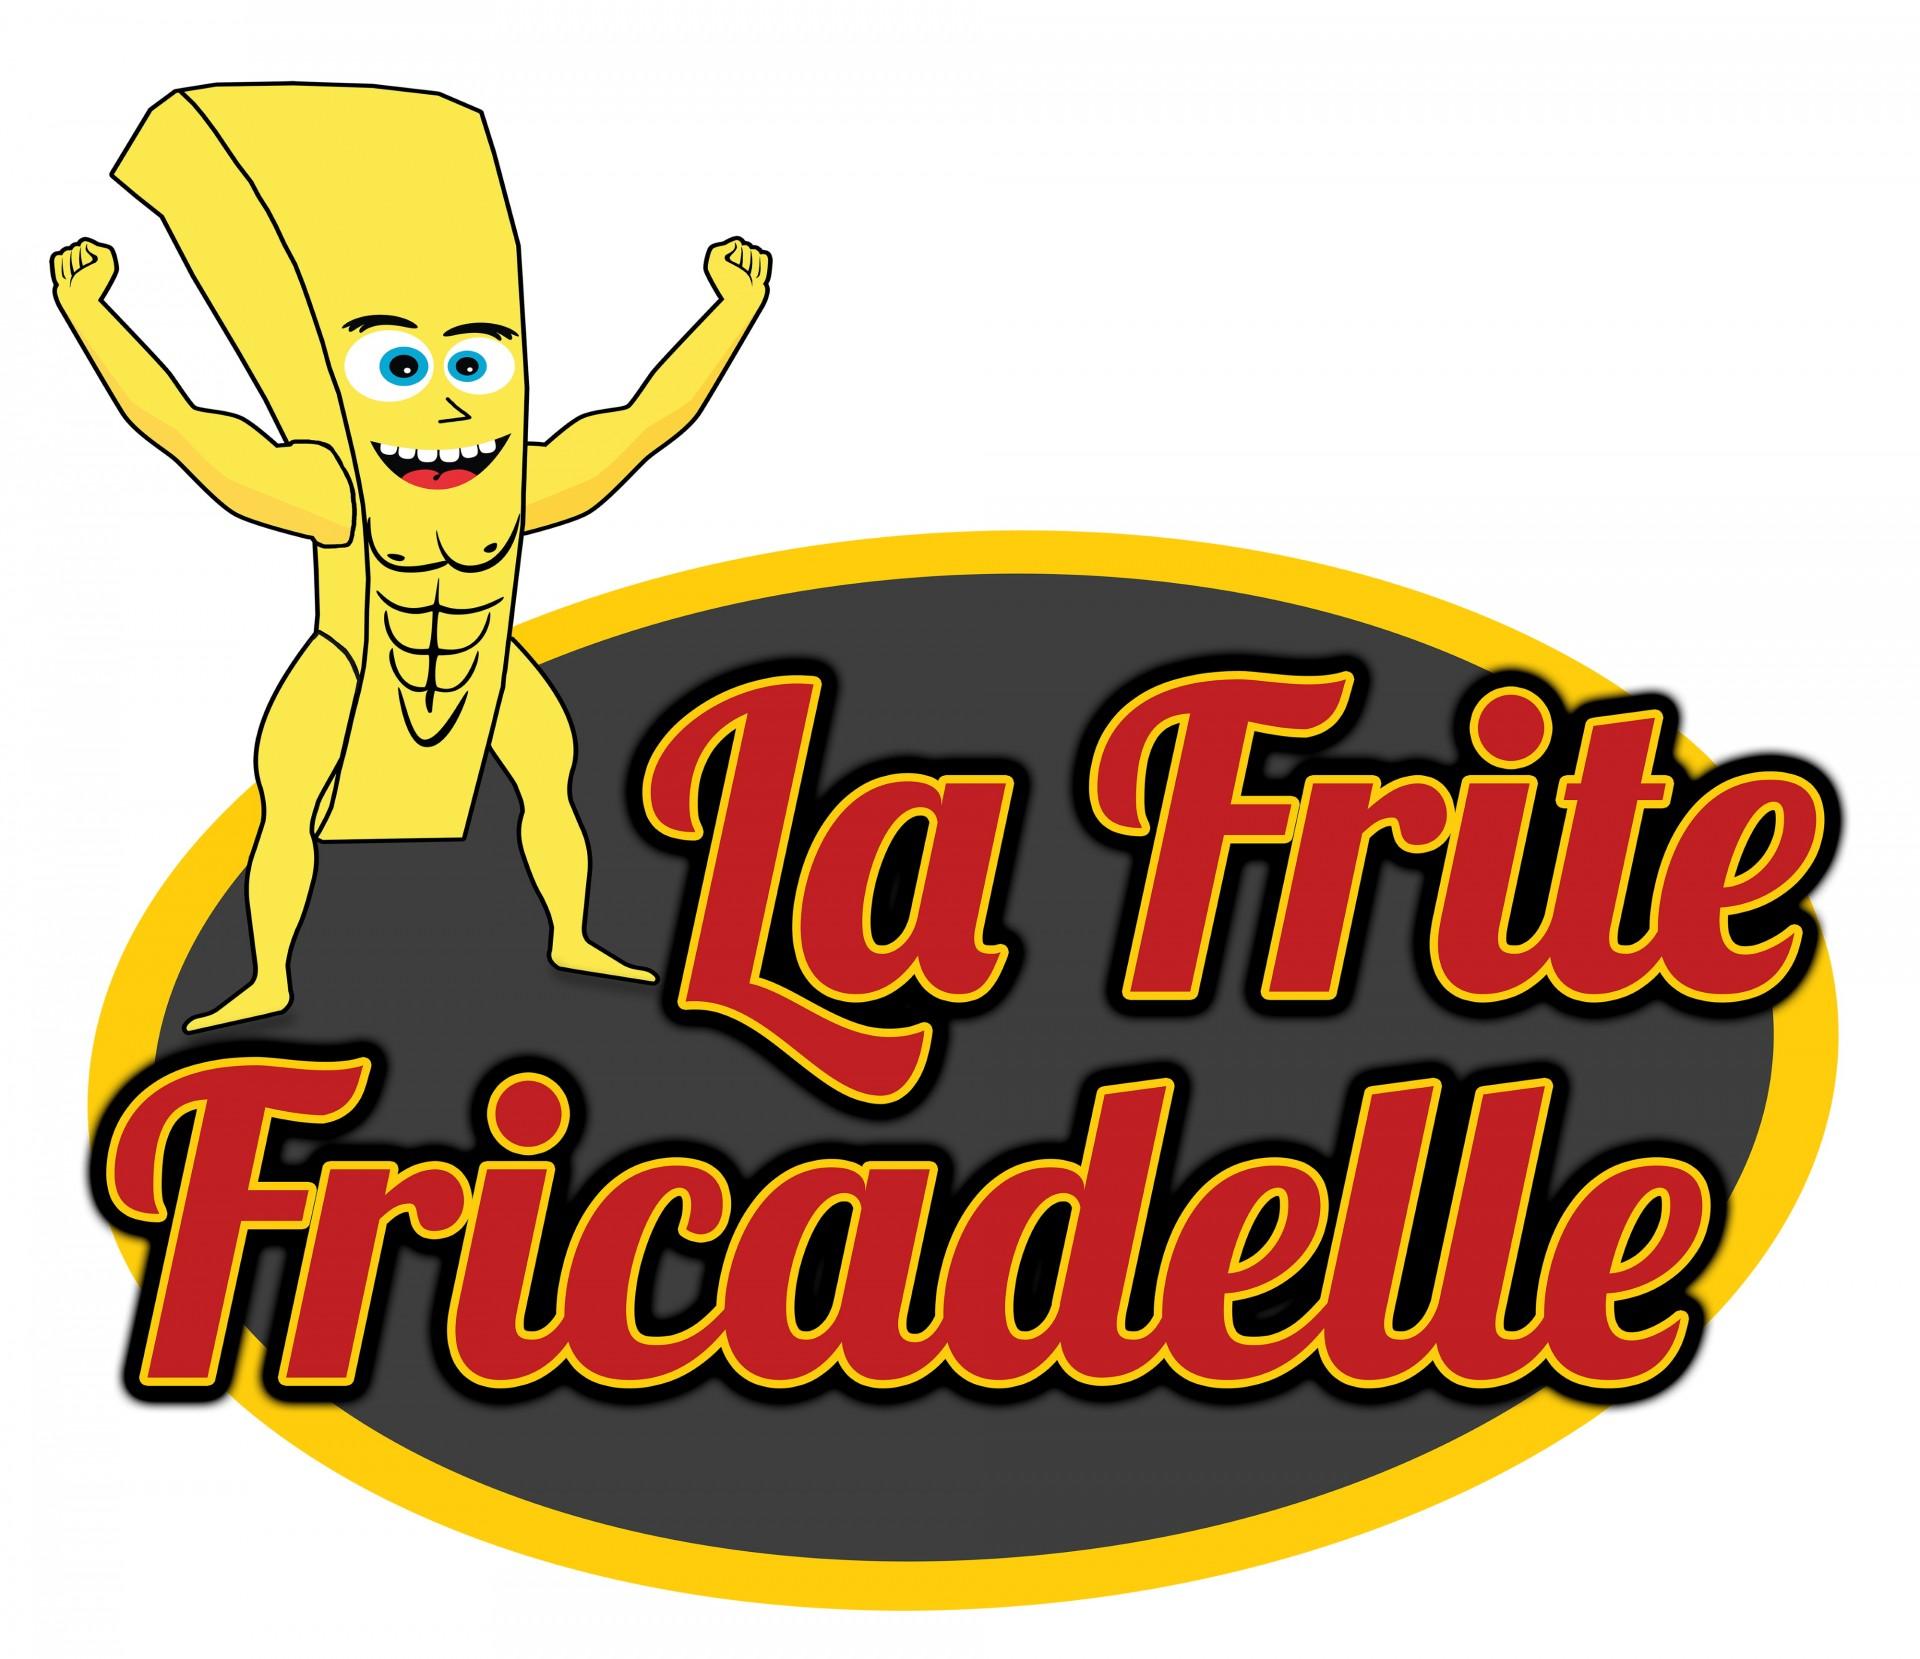 La Frite Fricadelle